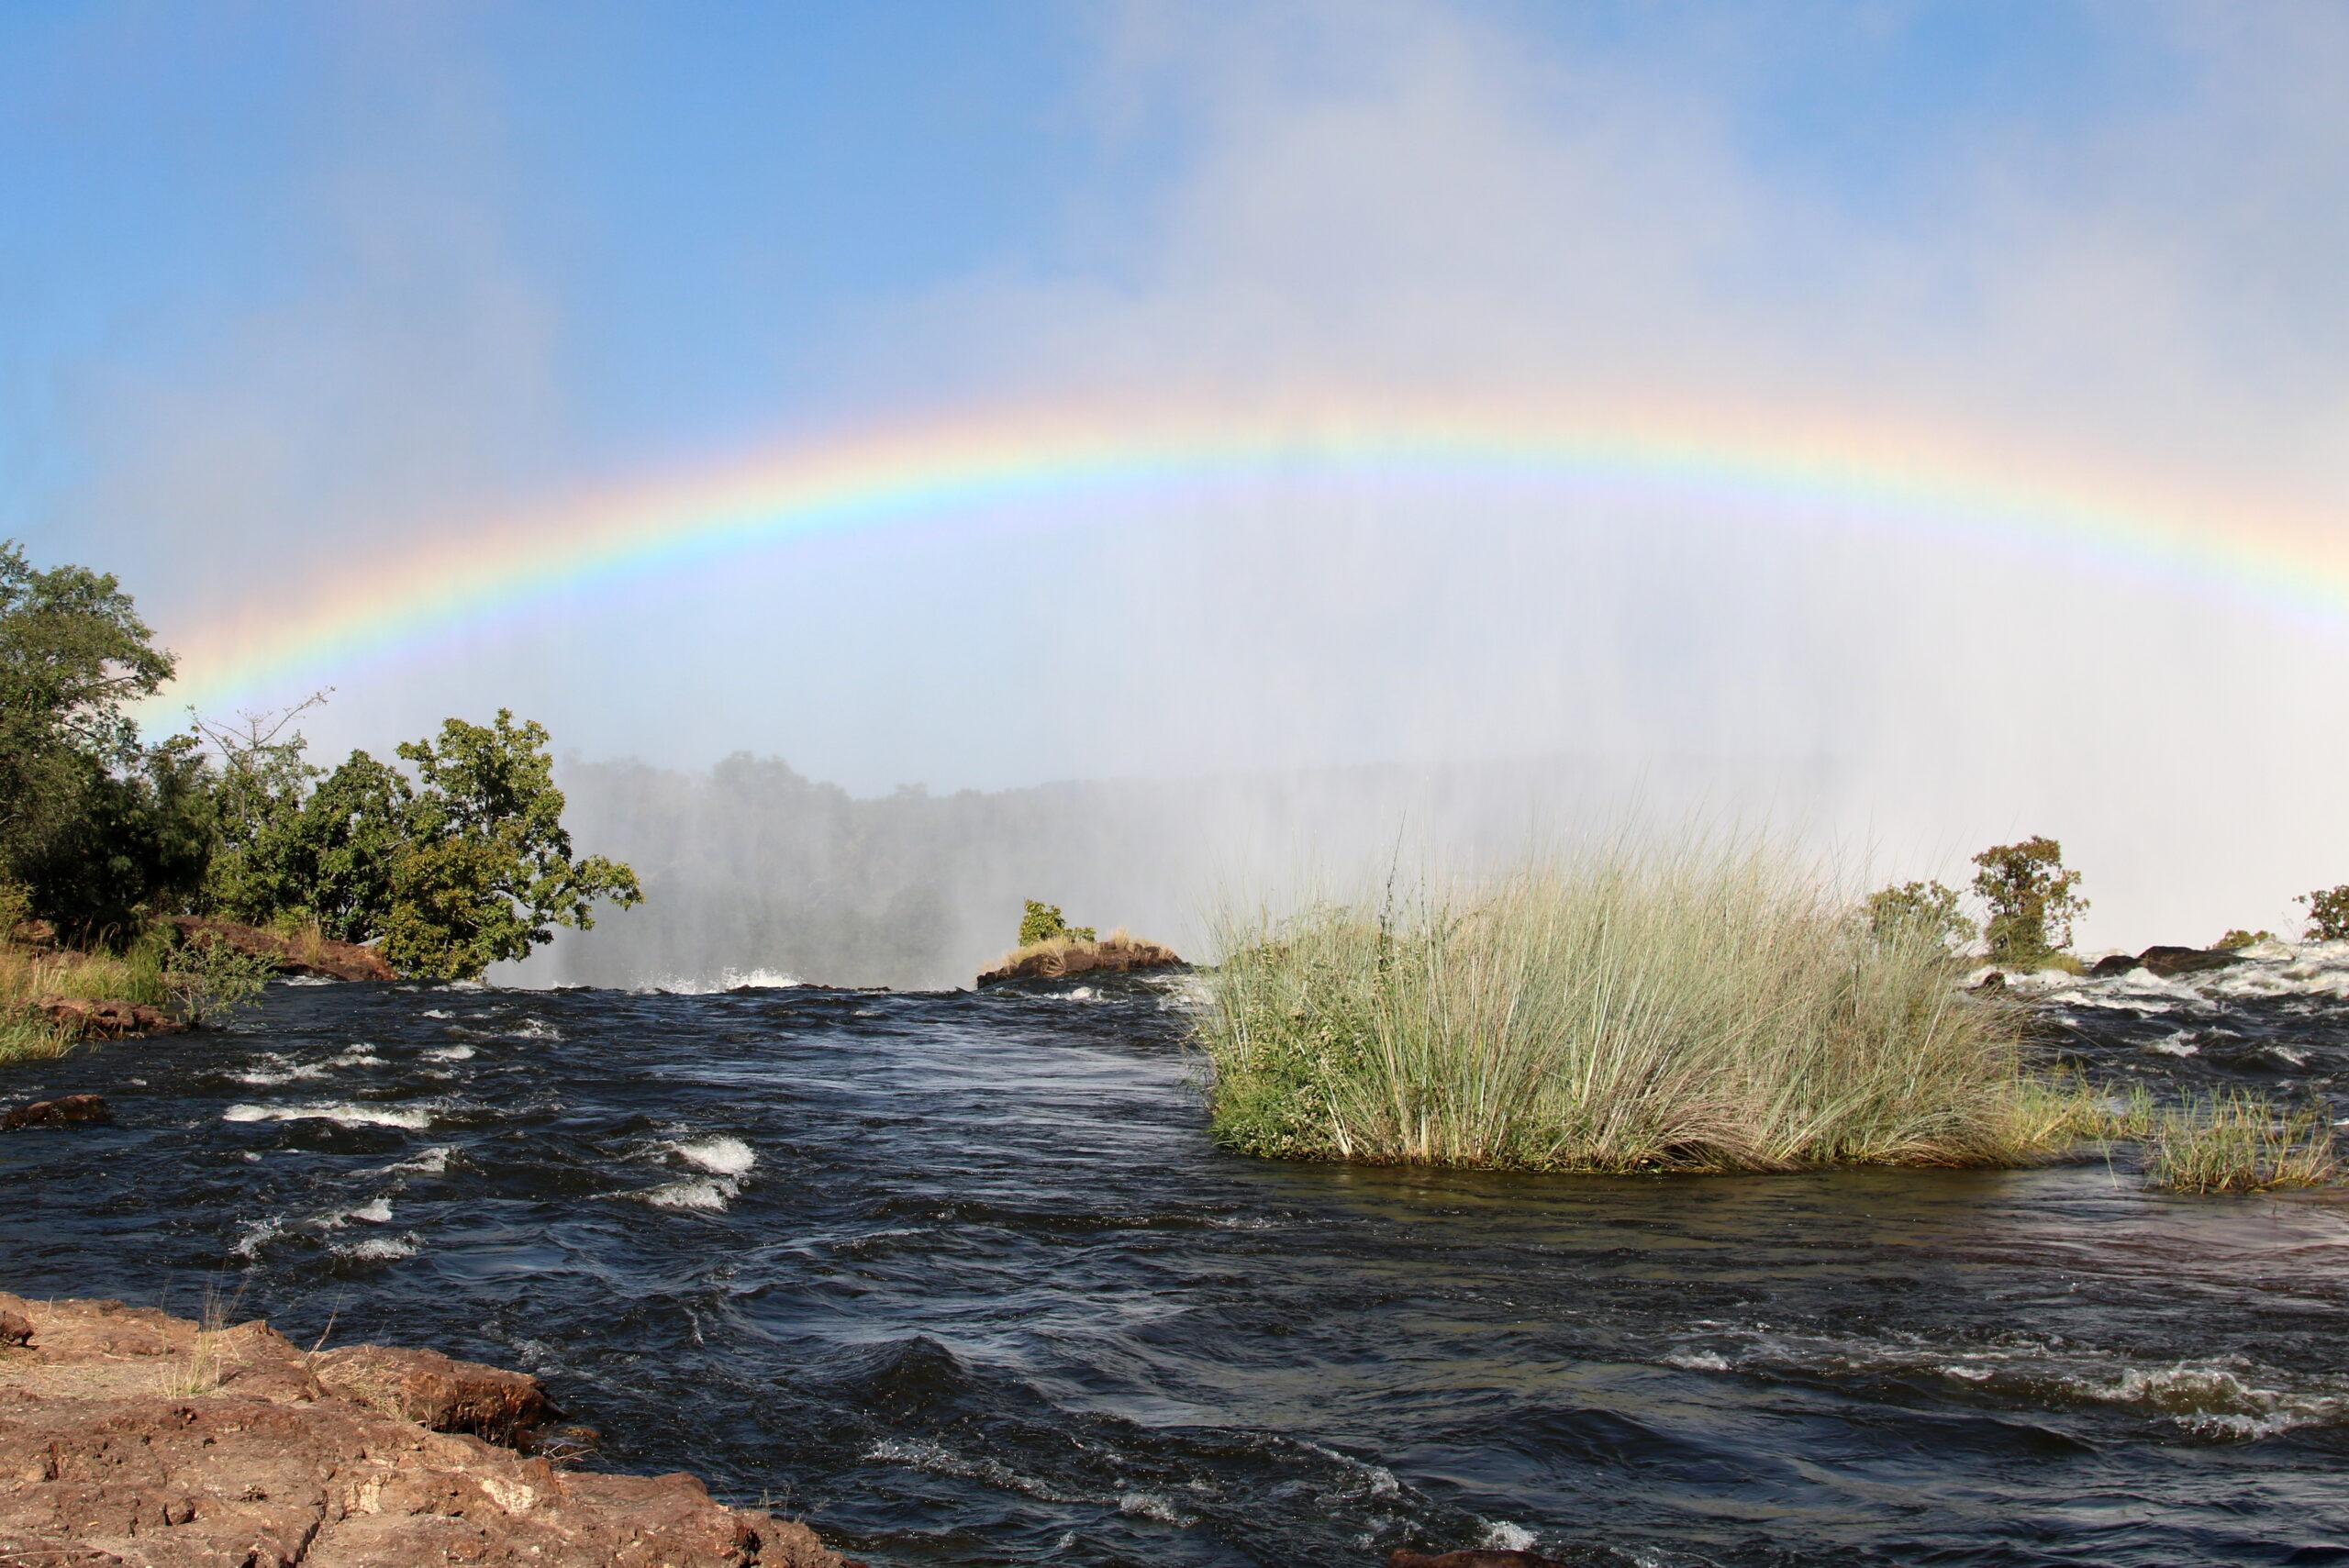 Highlights around the Victoria Falls